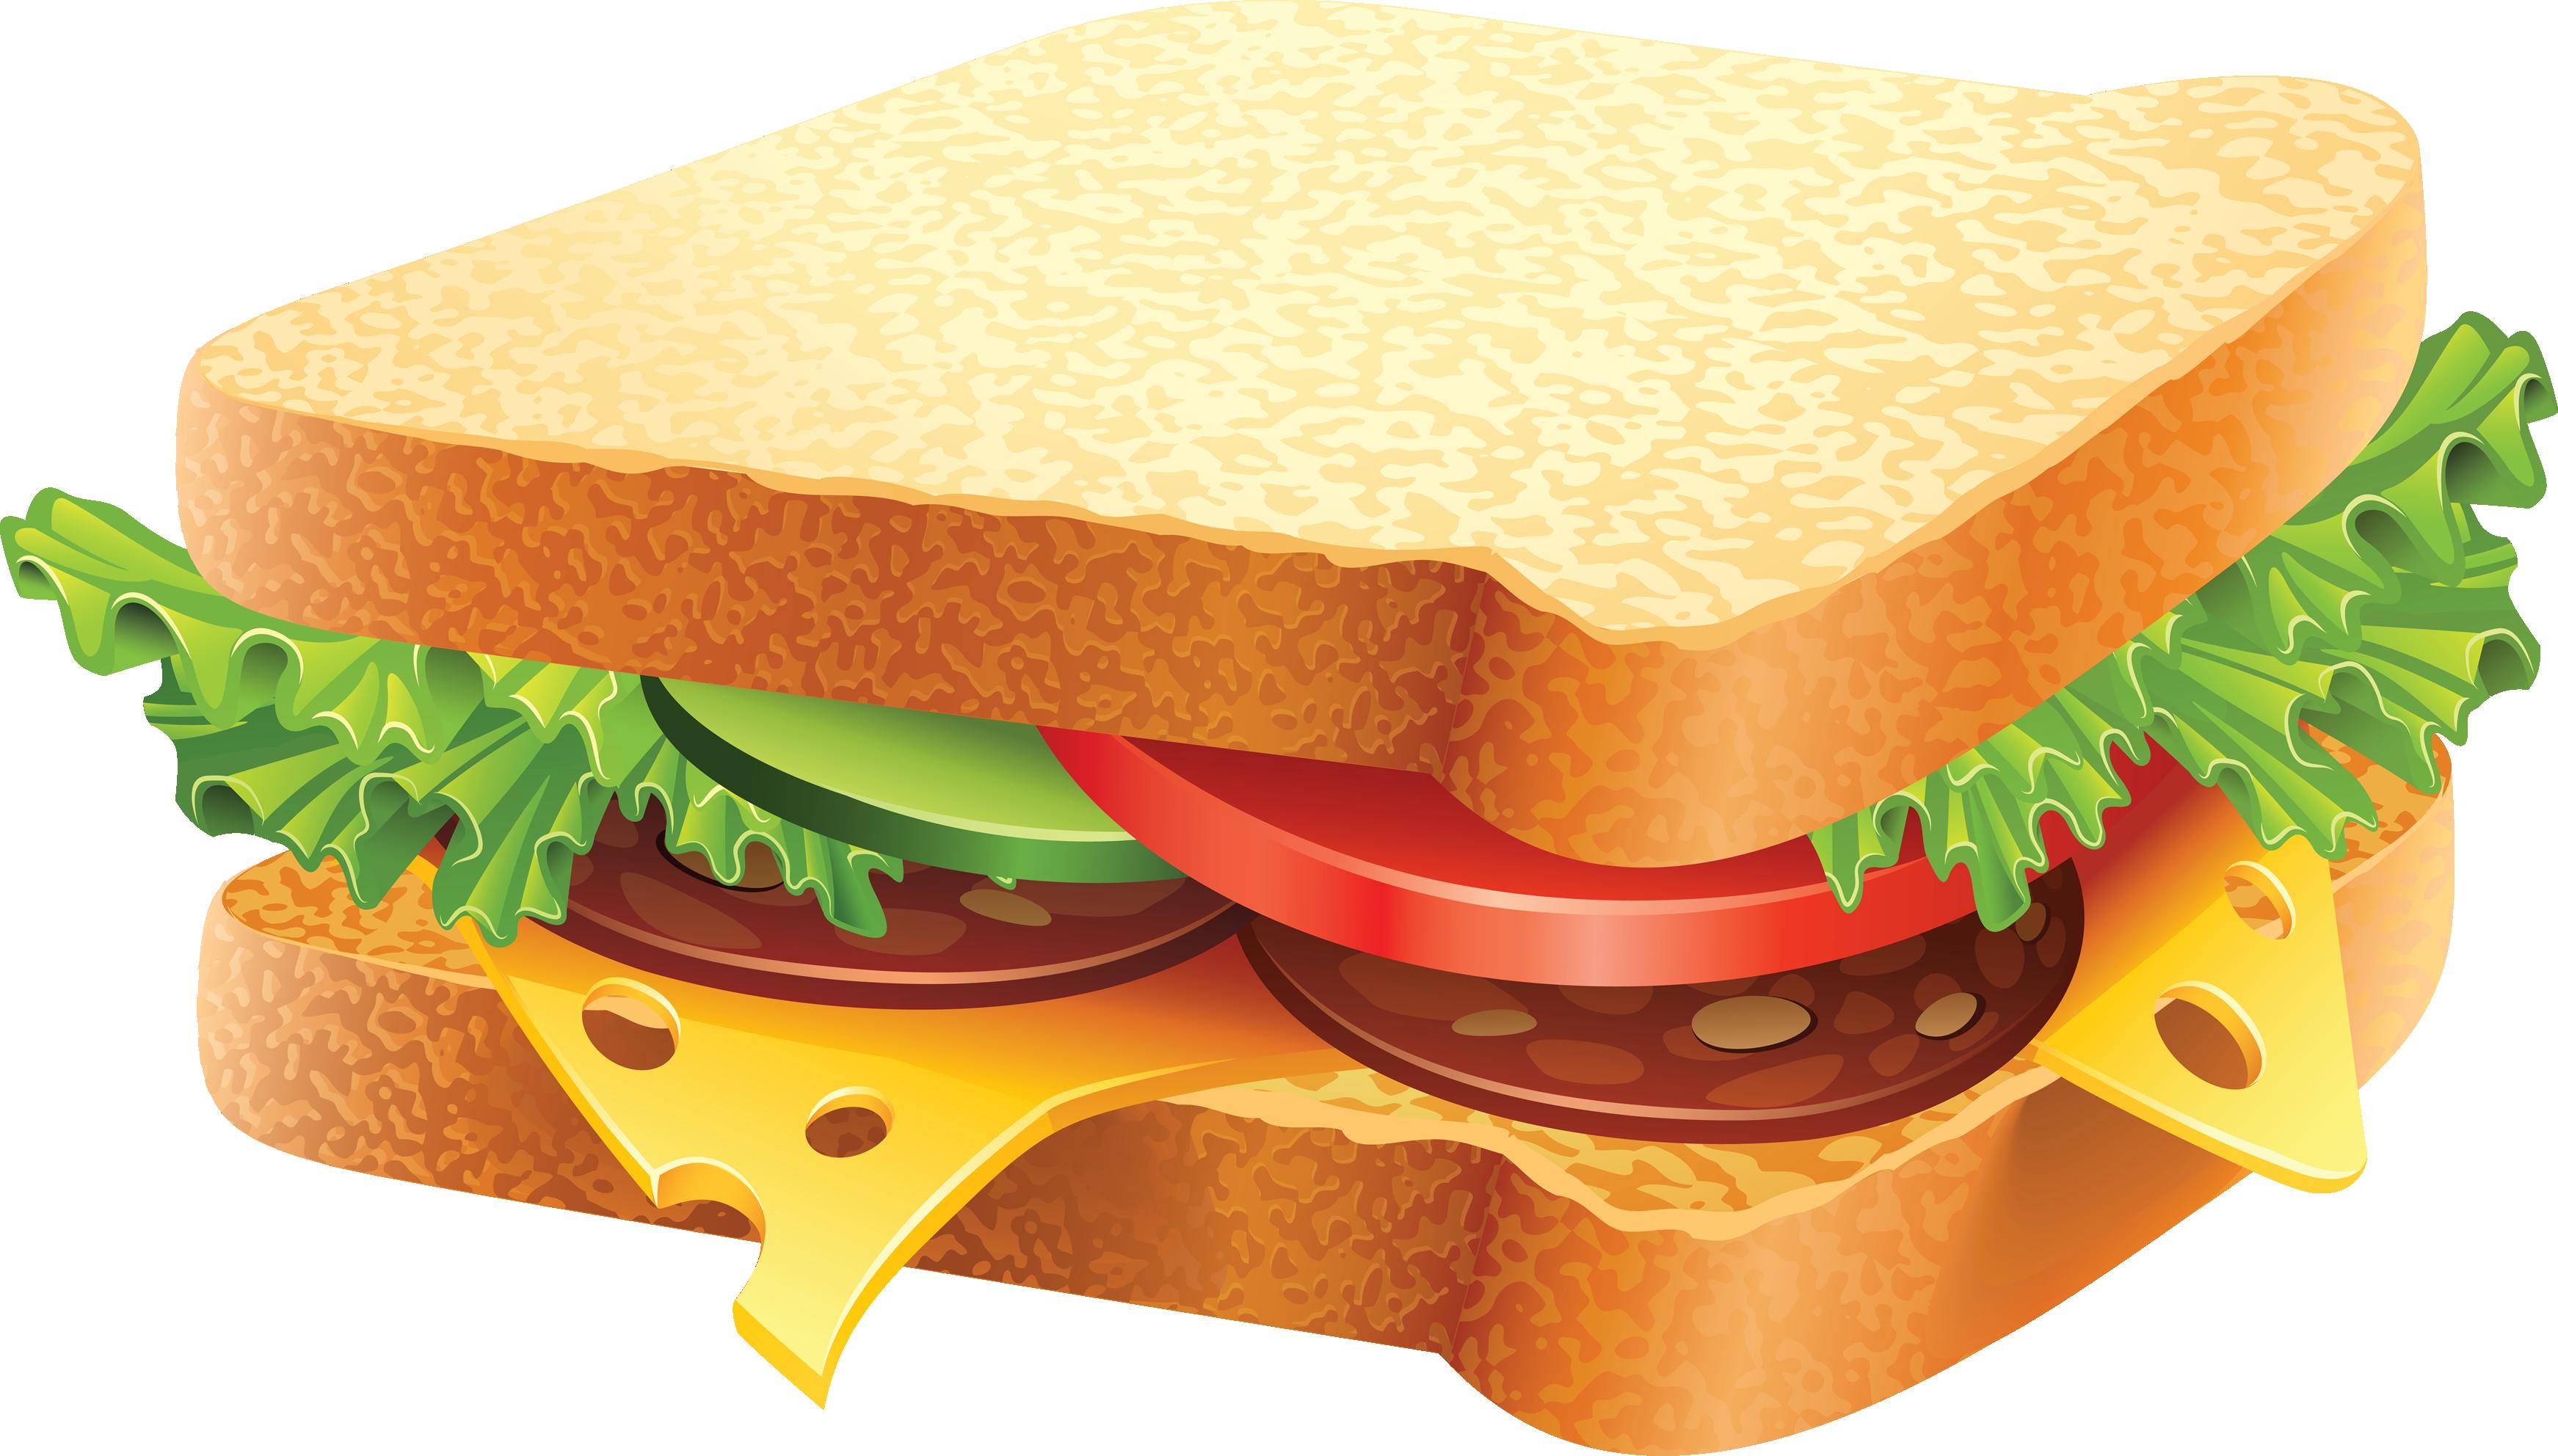 sandwich clip art free clipart panda free clipart images rh clipartpanda com clipart soup and sandwich clipart sandwich images